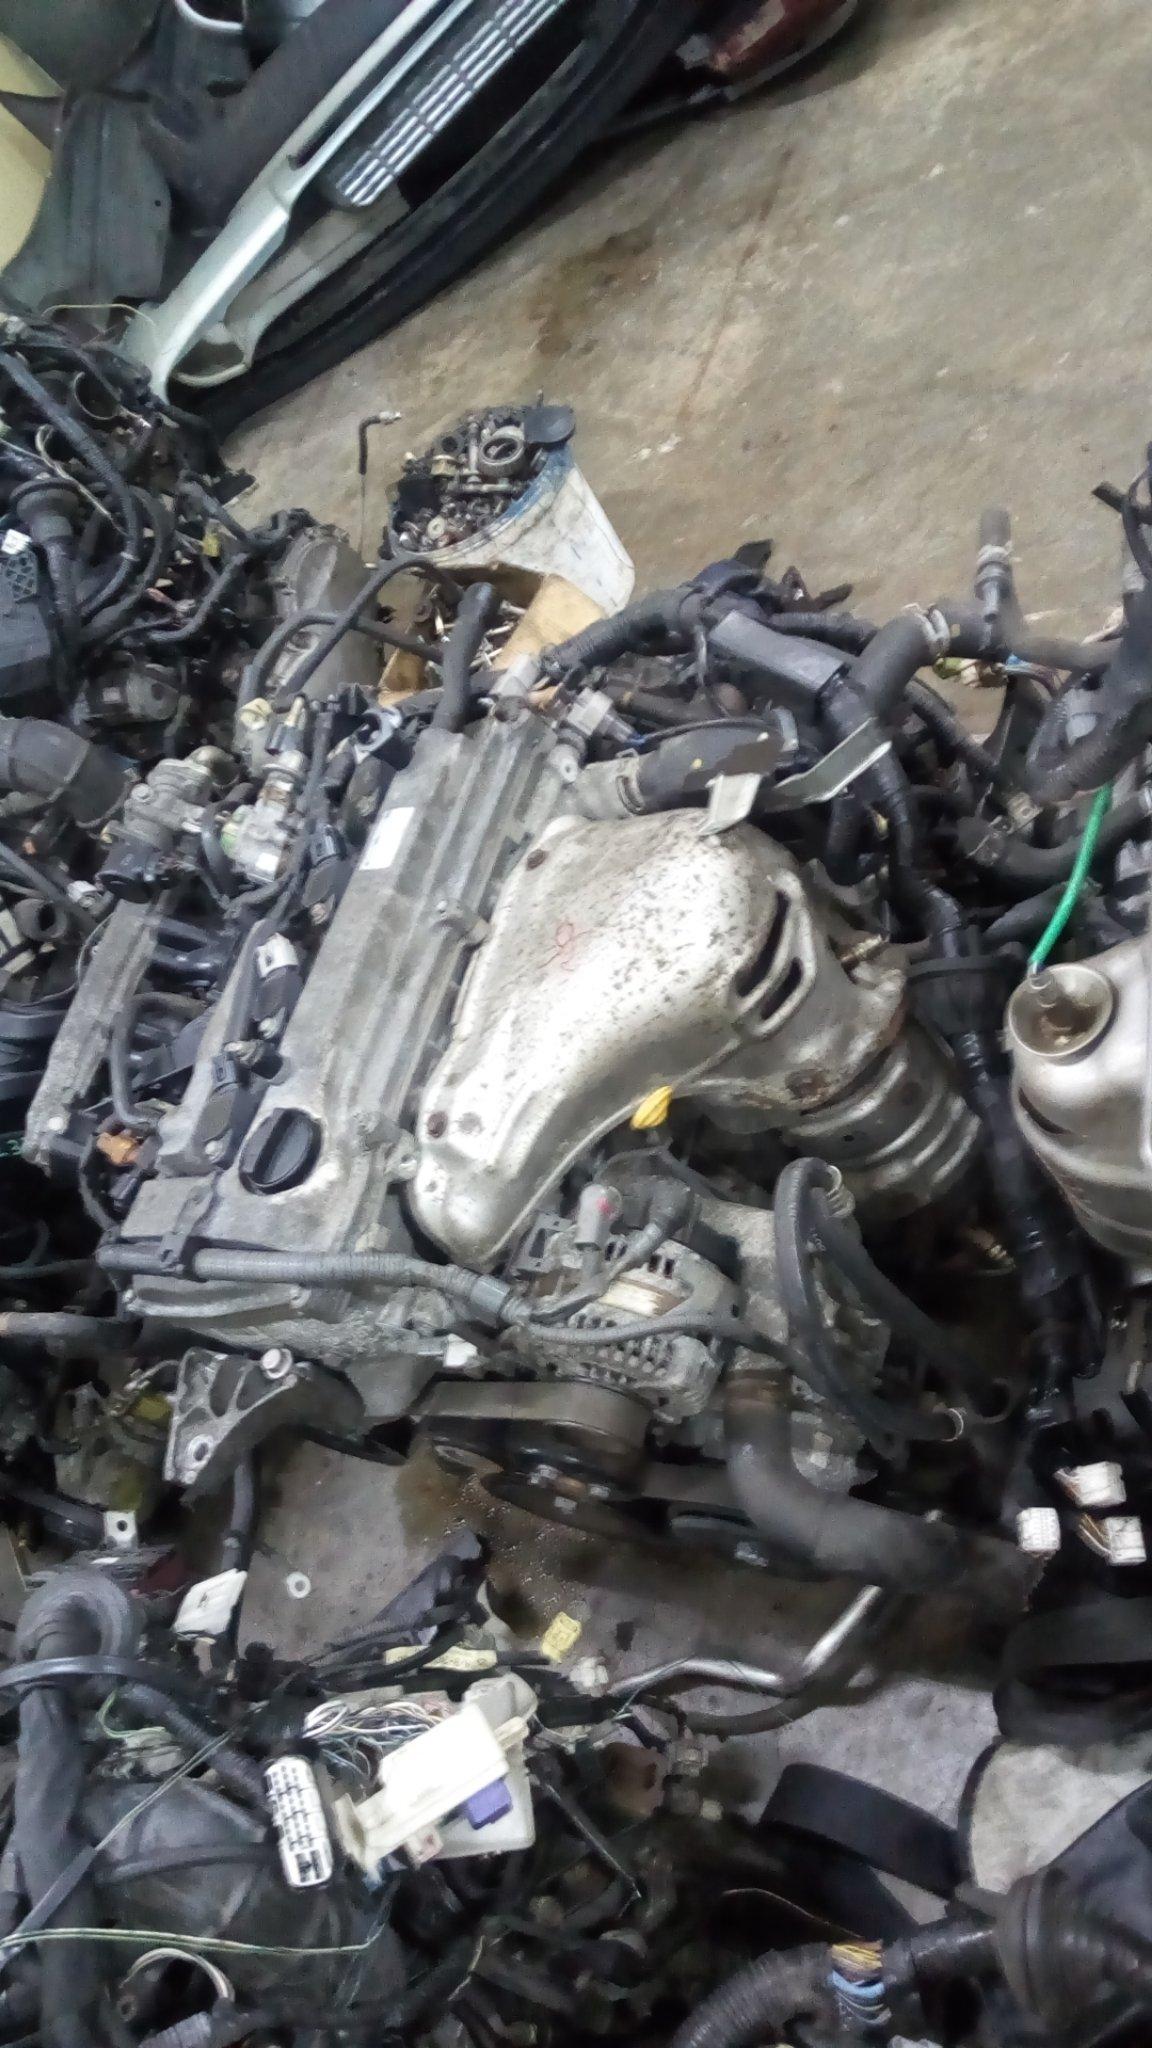 1AZ engine